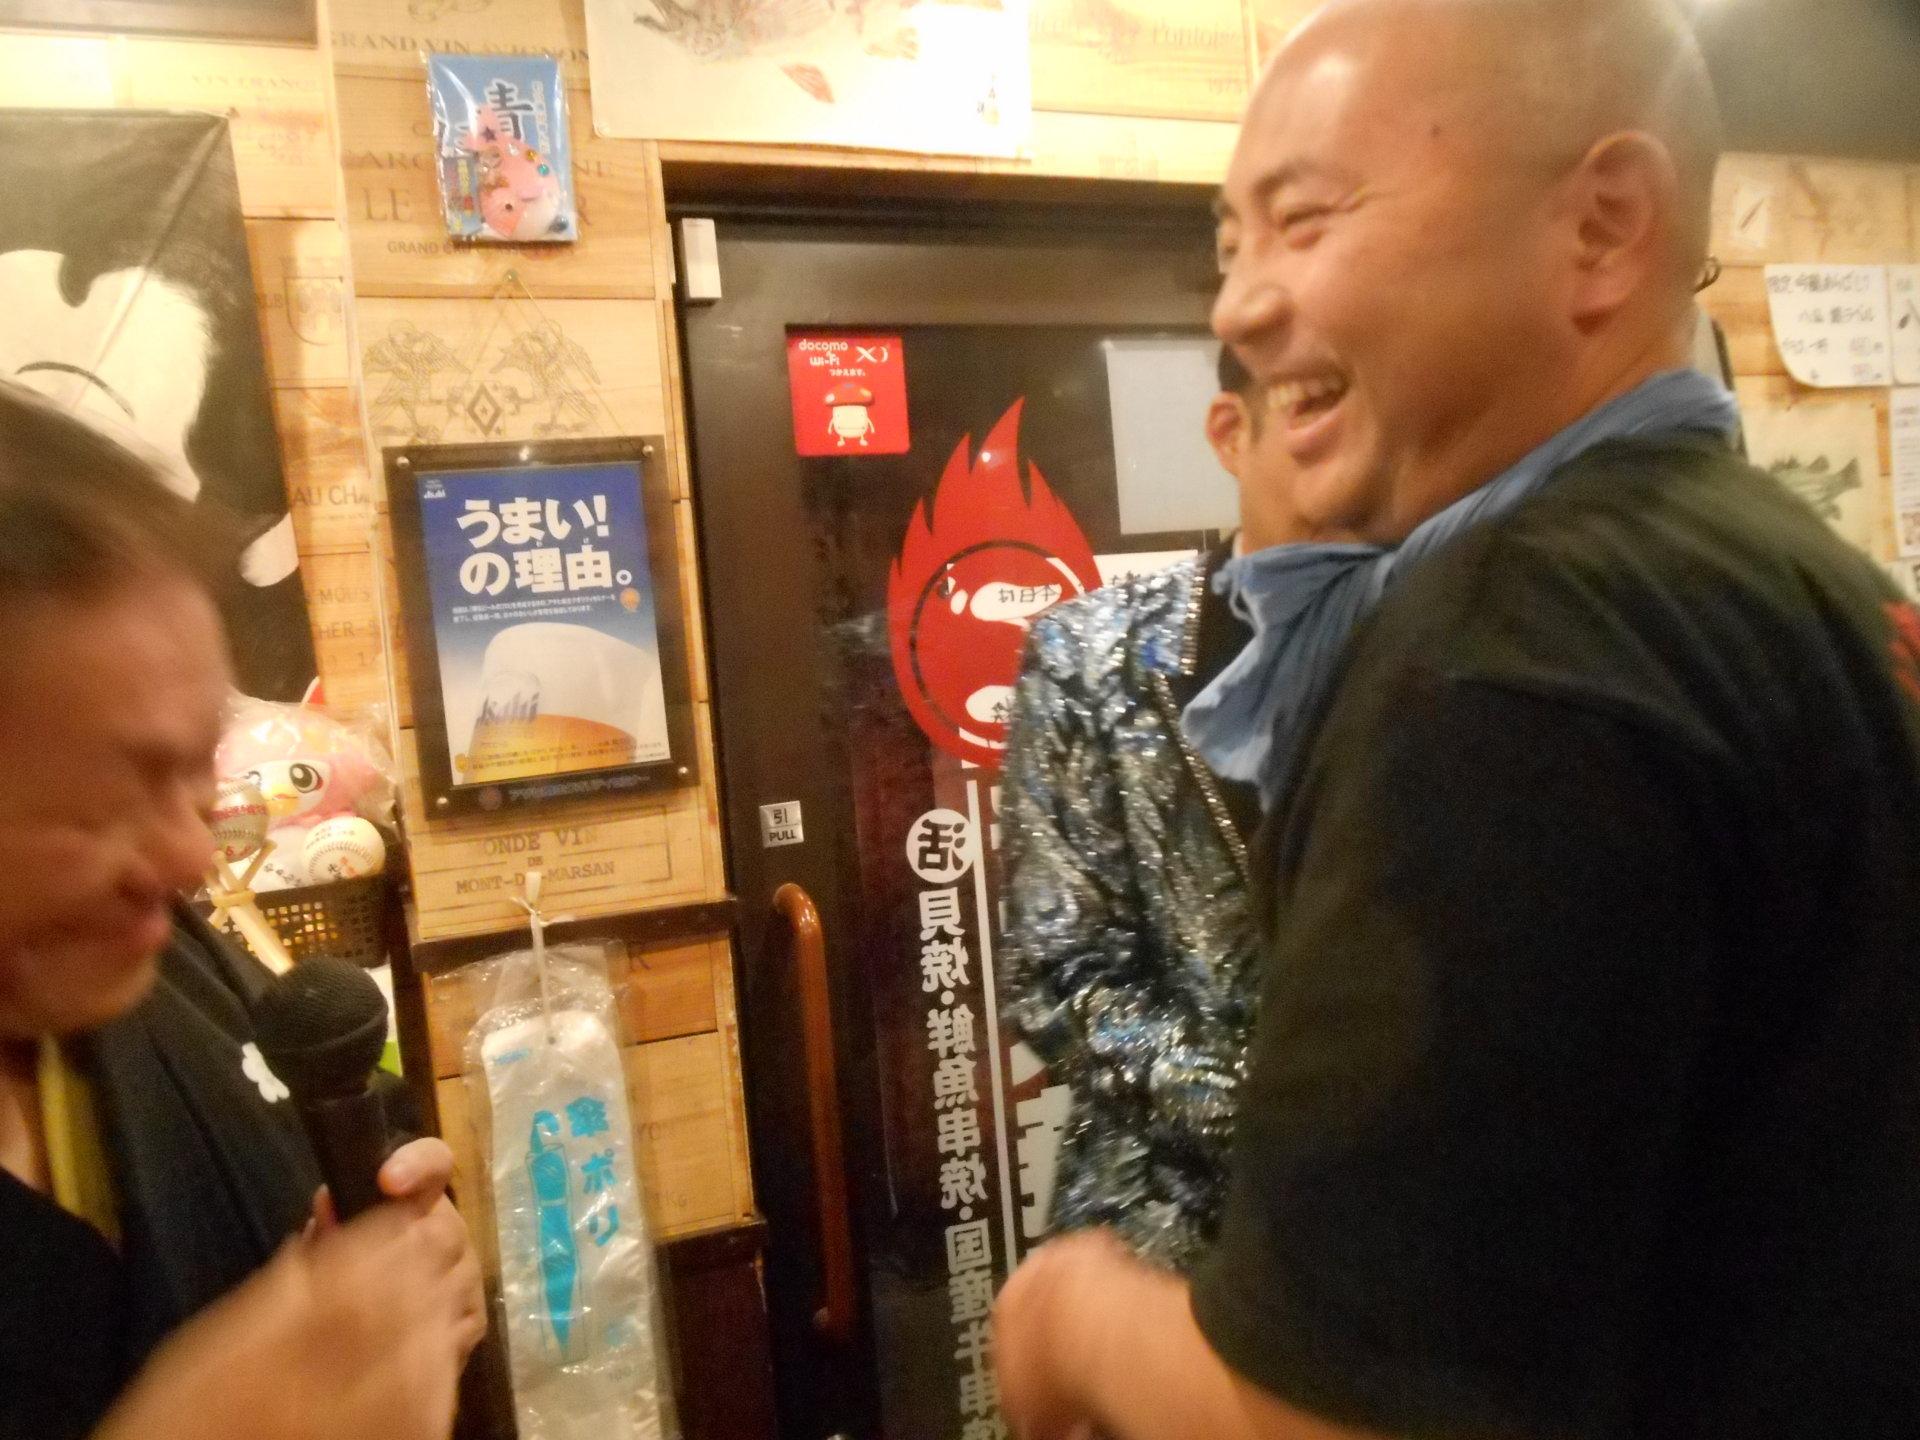 DSCN0617 1920x1440 - 2015年12月21日(月) AOsuki忘年会開催しました。